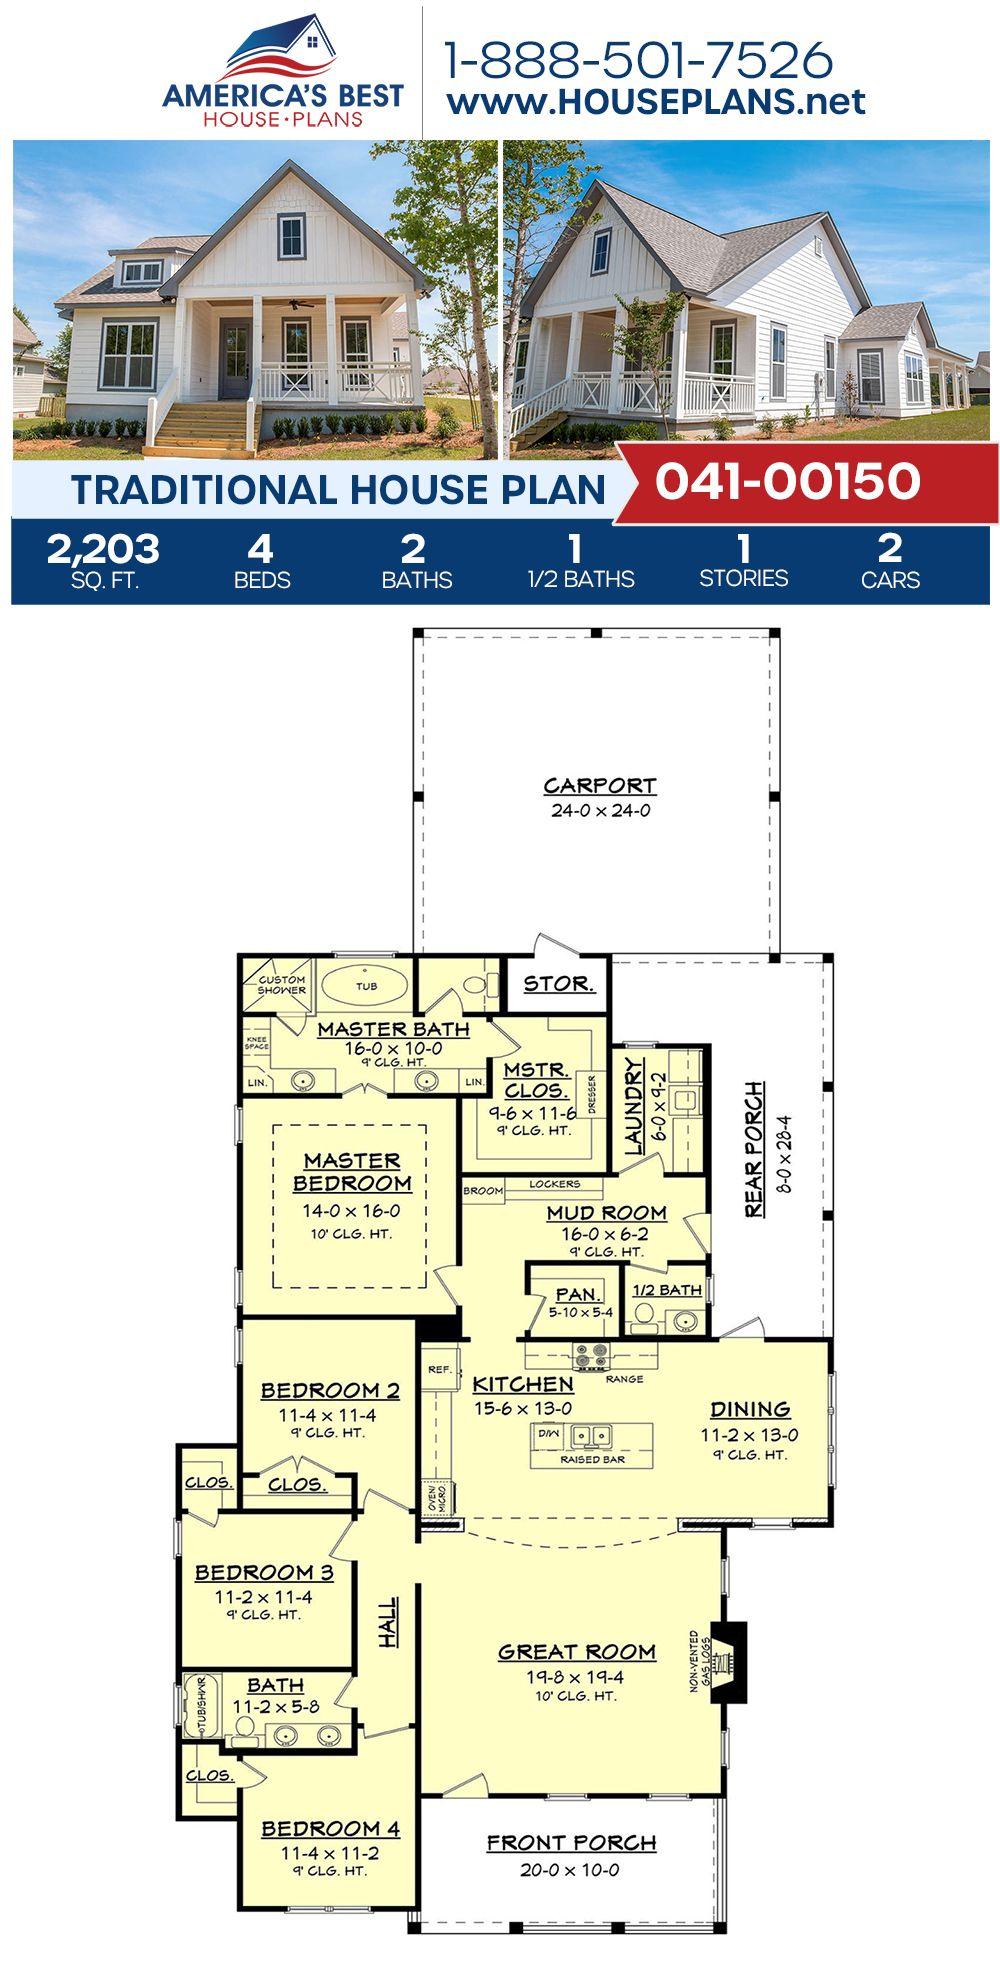 House Plan 041 00150 Traditional Plan 2 203 Square Feet 4 Bedrooms 2 5 Bathrooms In 2020 House Plans Dream House Plans Traditional House Plan